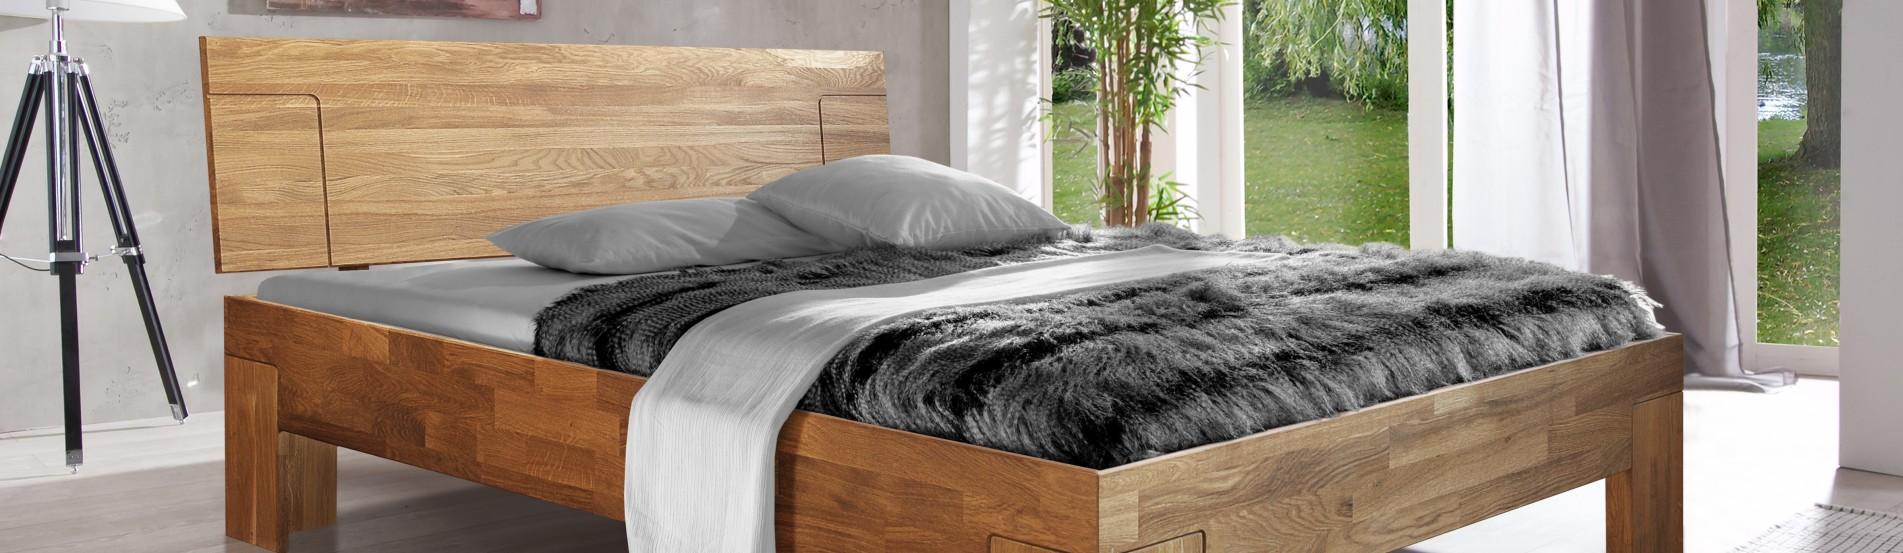 łóżko dębowe SARA